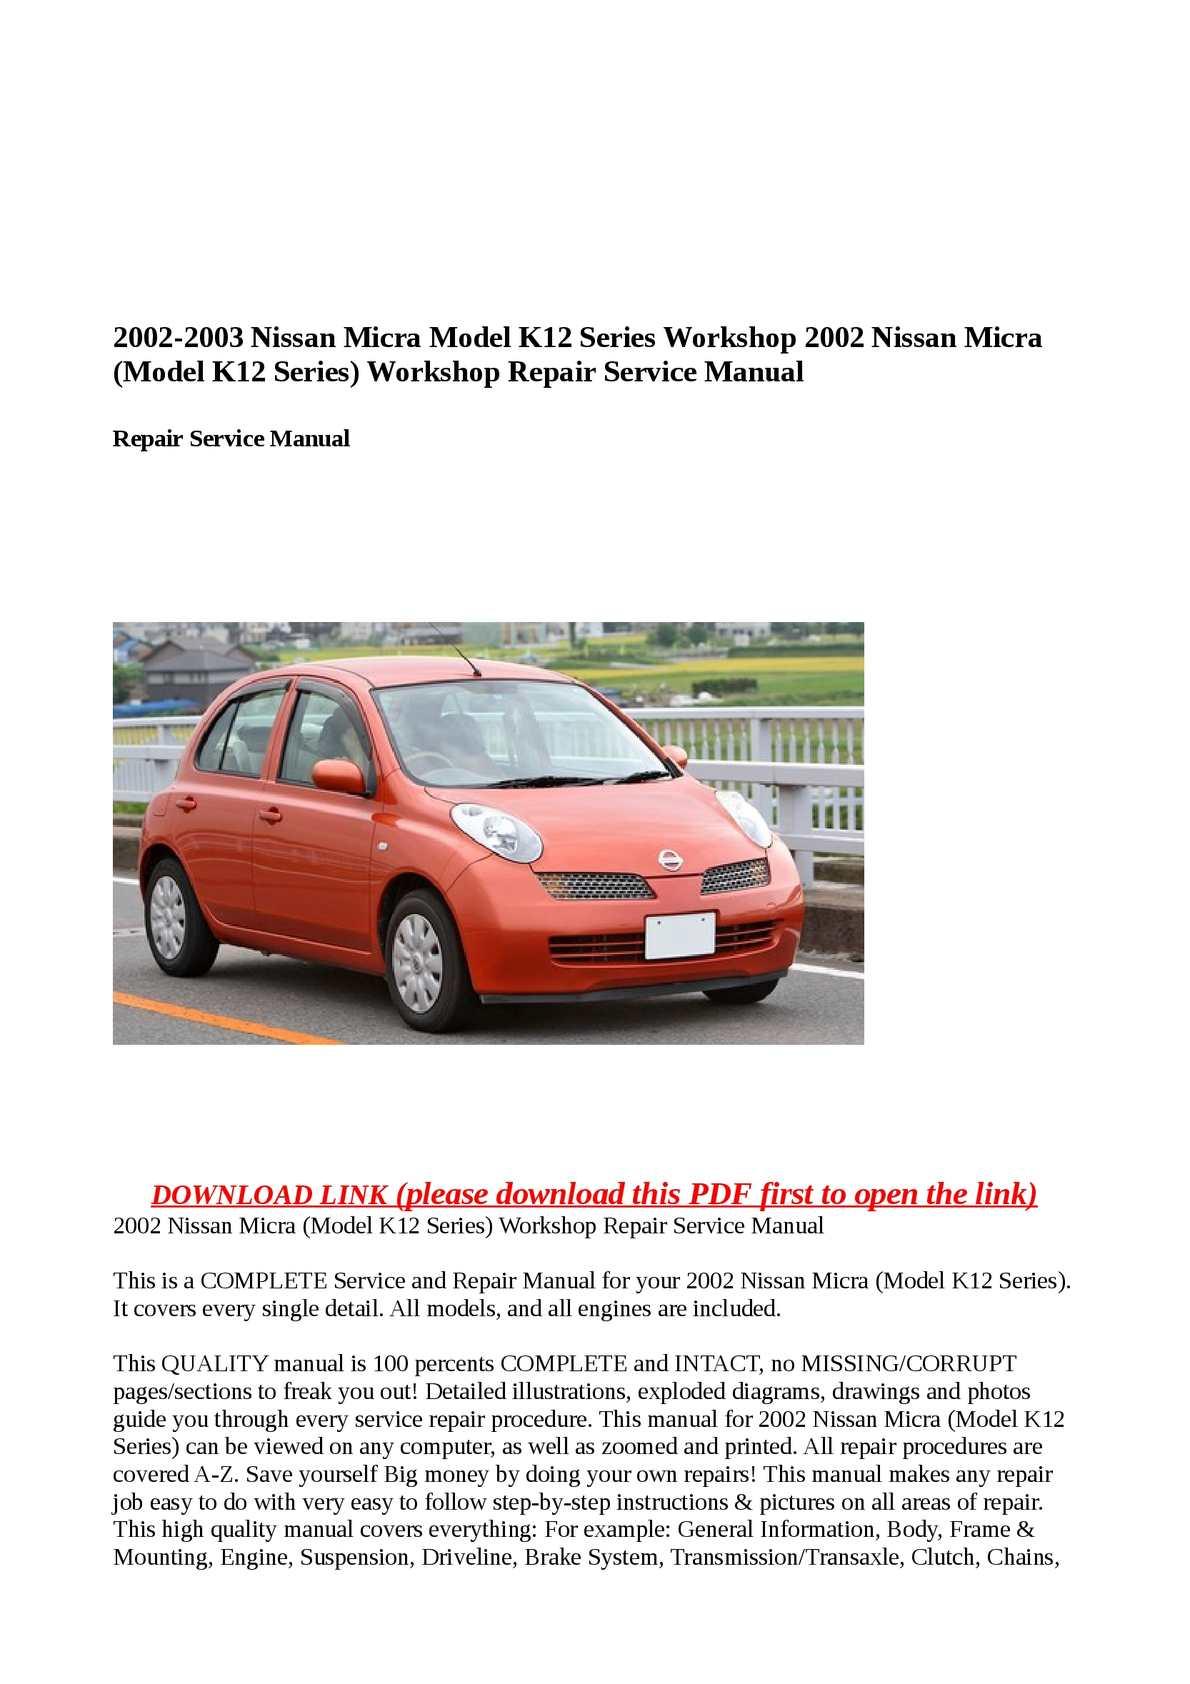 Calaméo - 2002 Nissan Micra (Model K12 Series) Workshop Repair Service  Manual